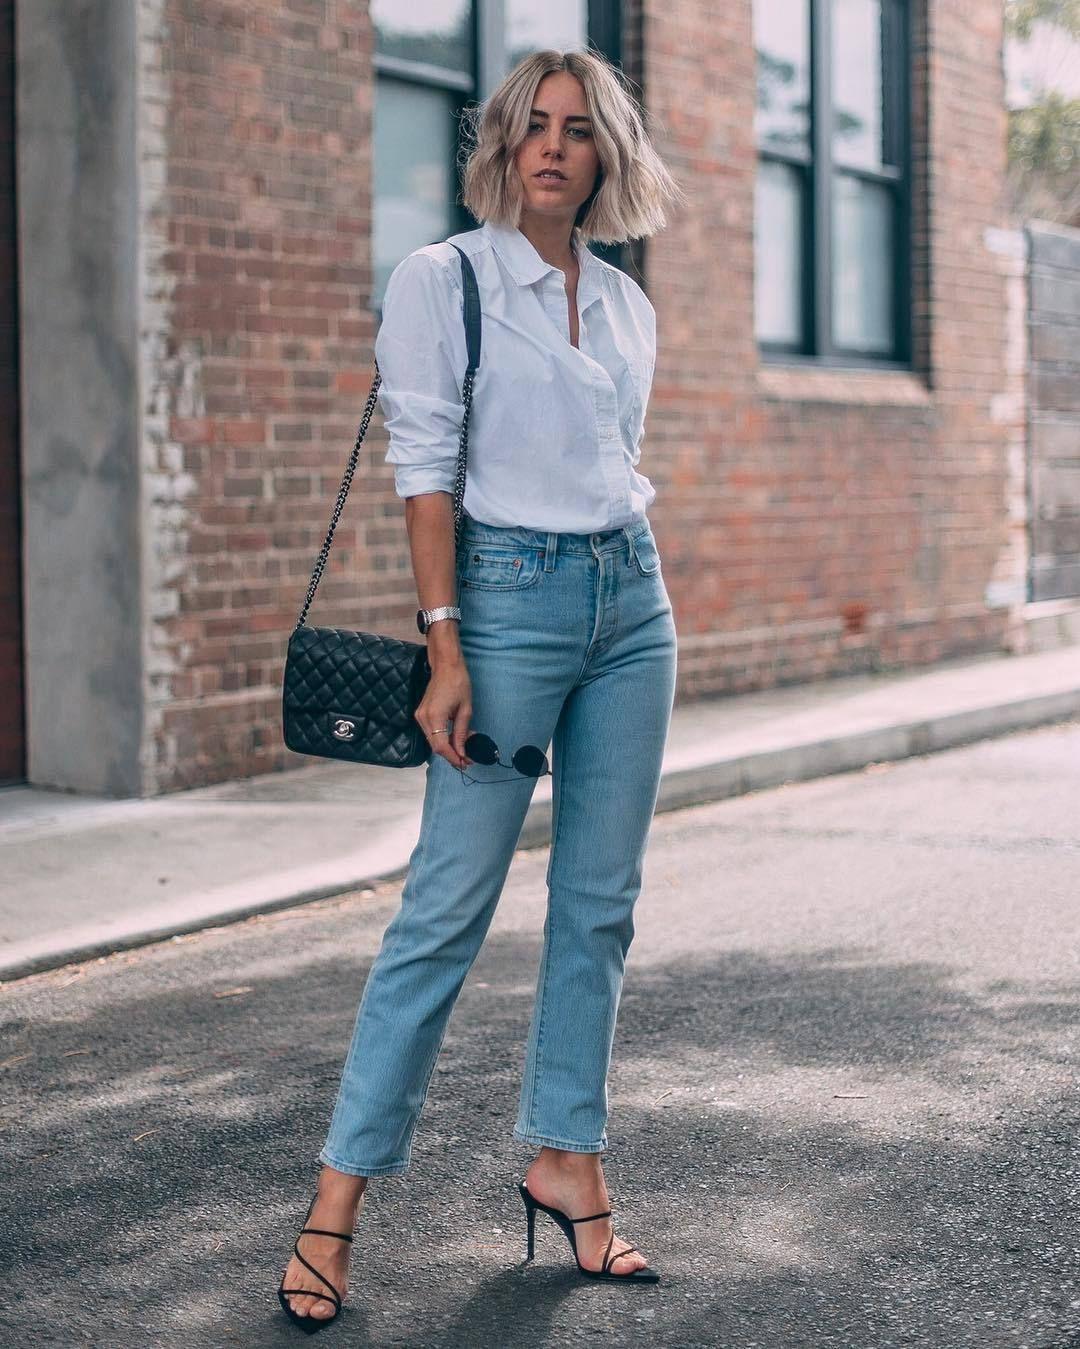 Jeans, $245 at revolve.com – Wheretoget